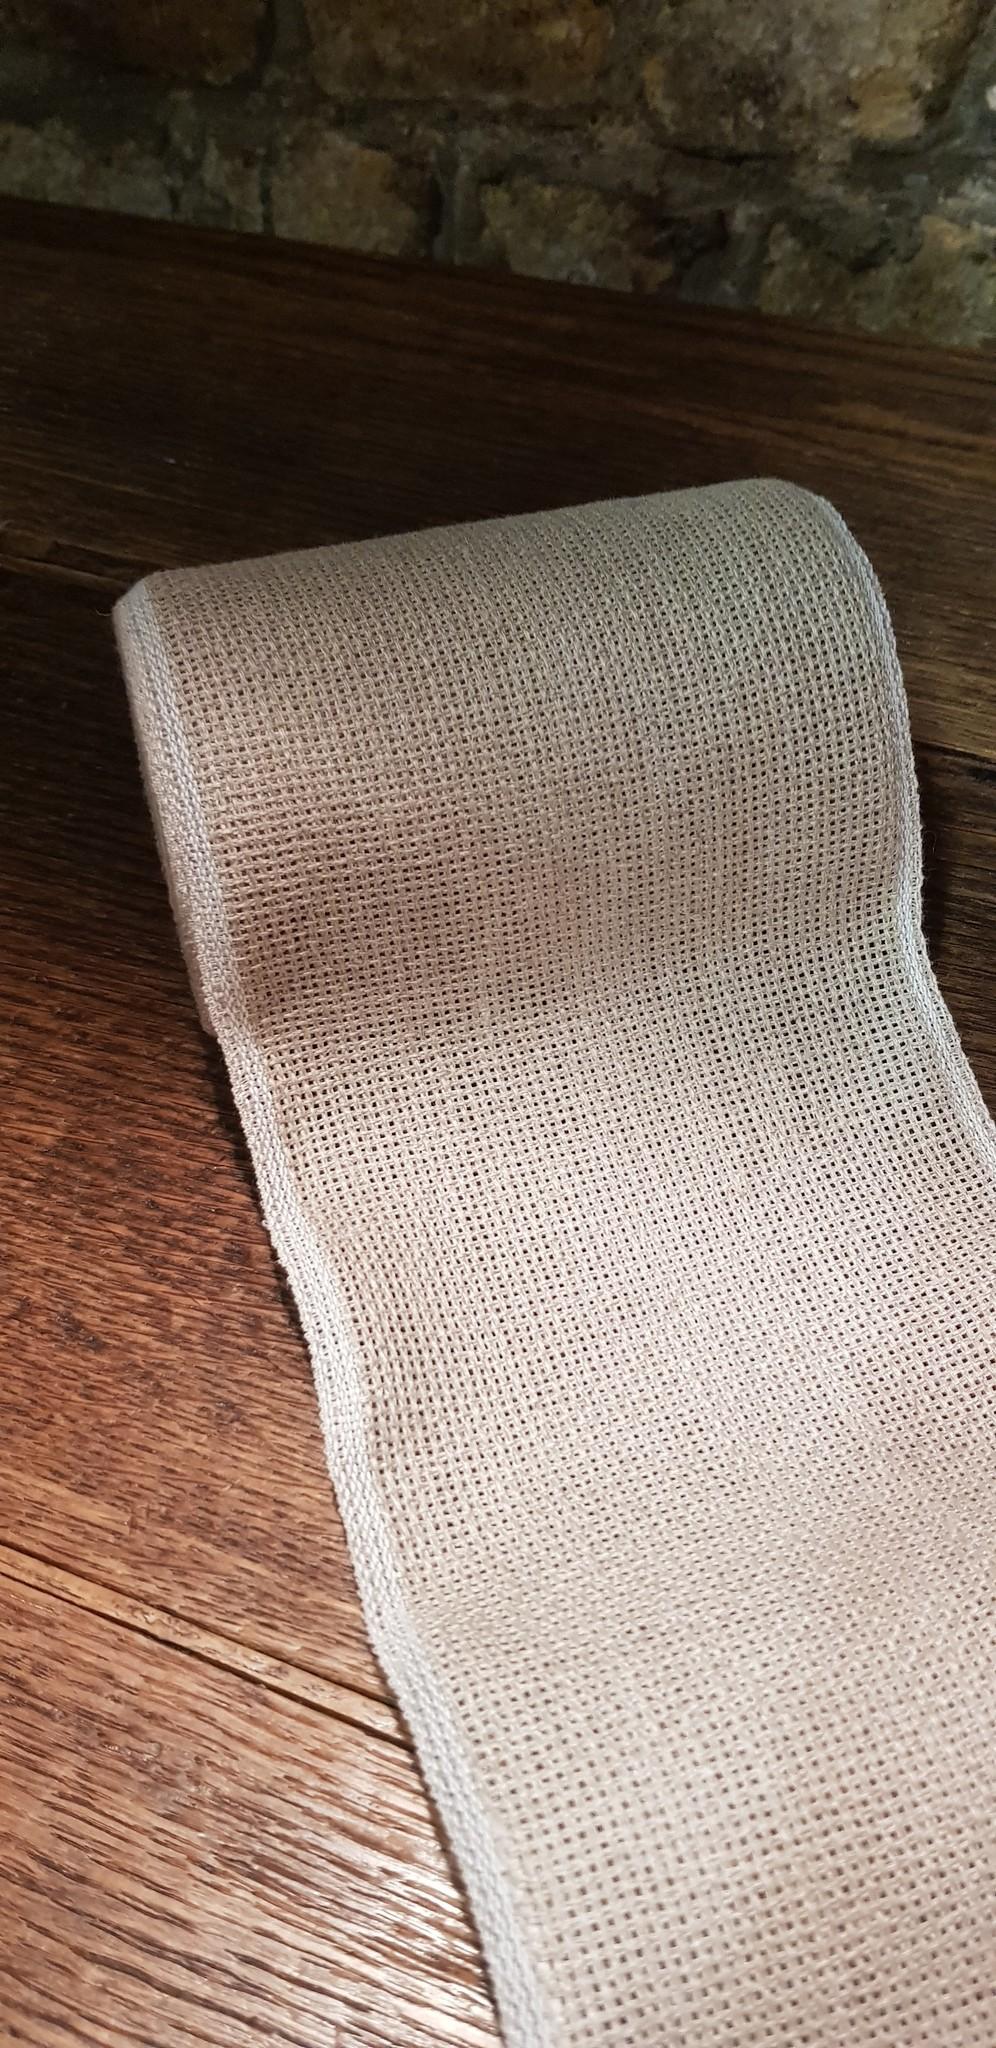 Le grenier du lin embroidery tape